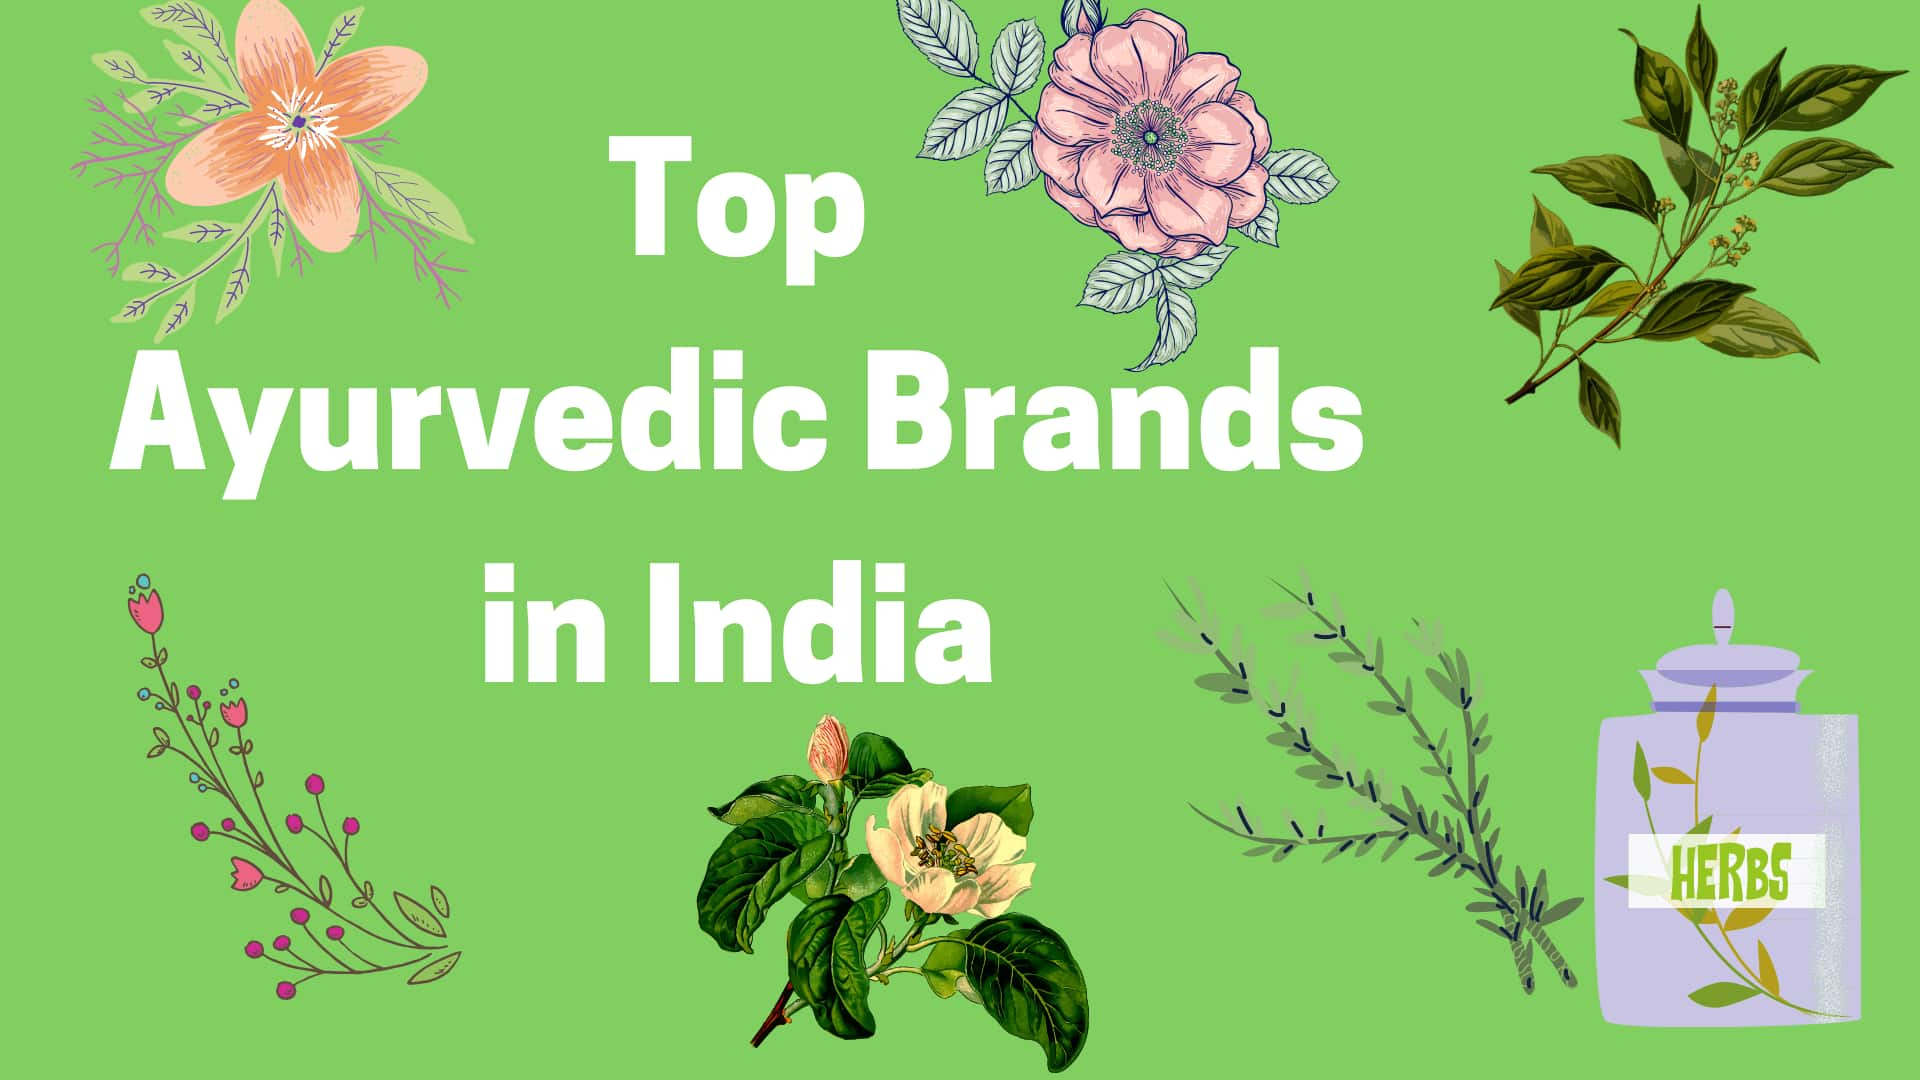 Top ayurvedic brands in India